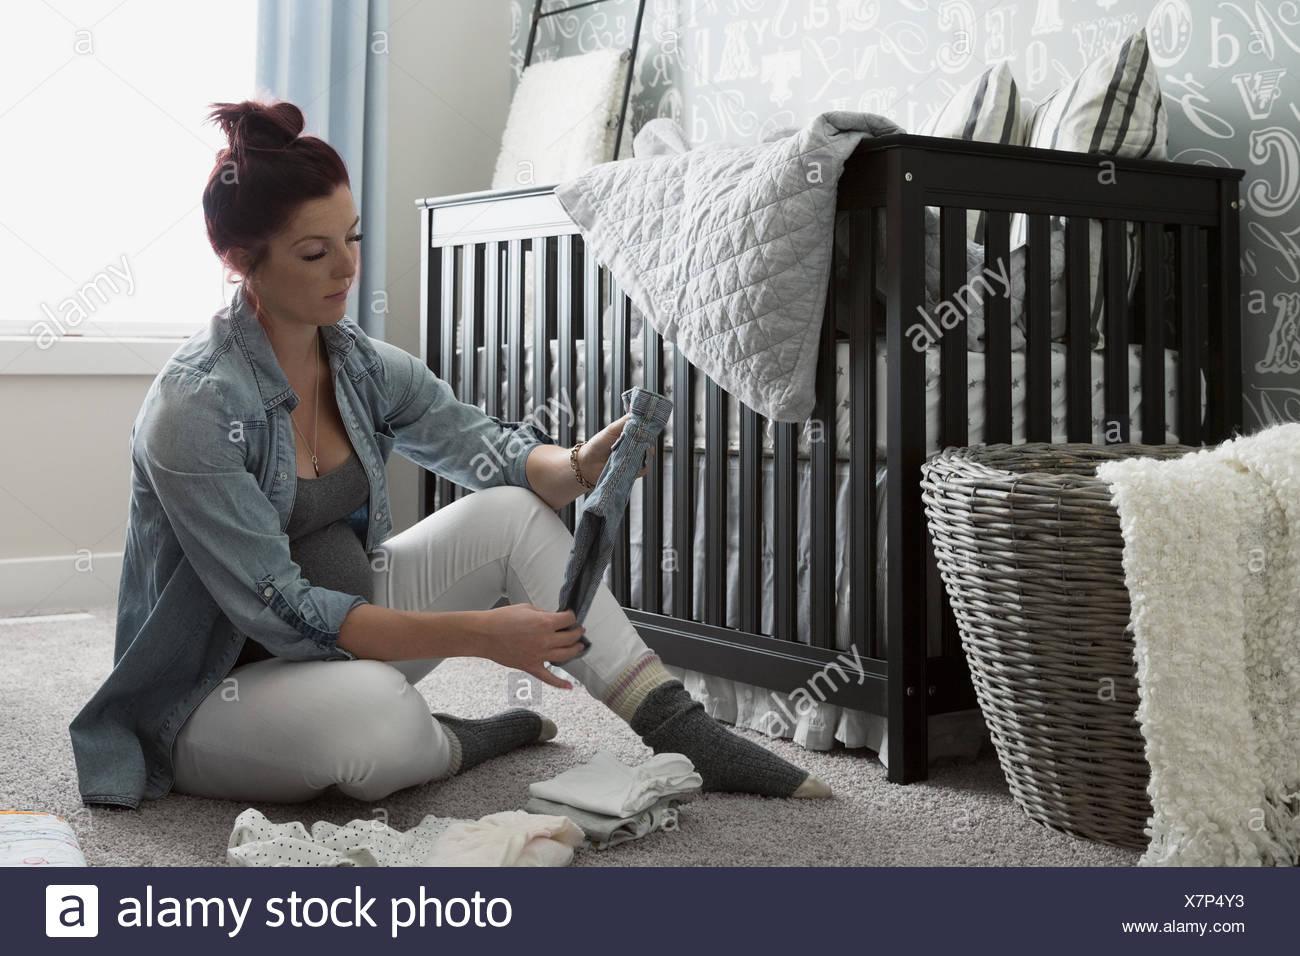 Schwangere Frau betrachten Baby-Kleidung im Kindergarten Stockbild